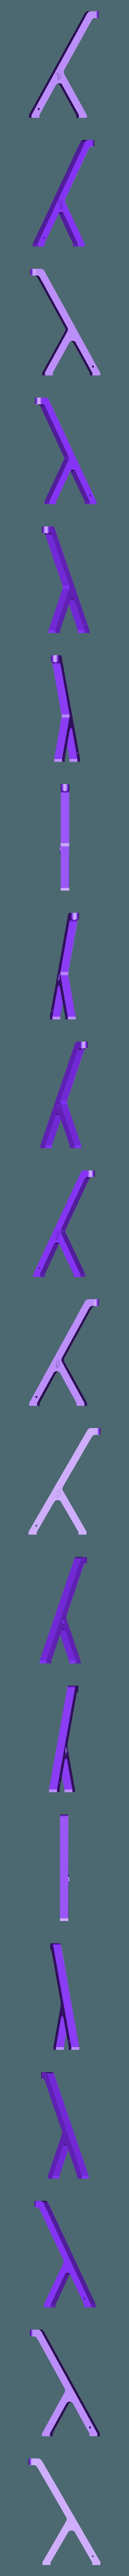 arms_x3.stl Download free STL file Tensegrity Table High Strength • 3D print design, tylerbrunstein